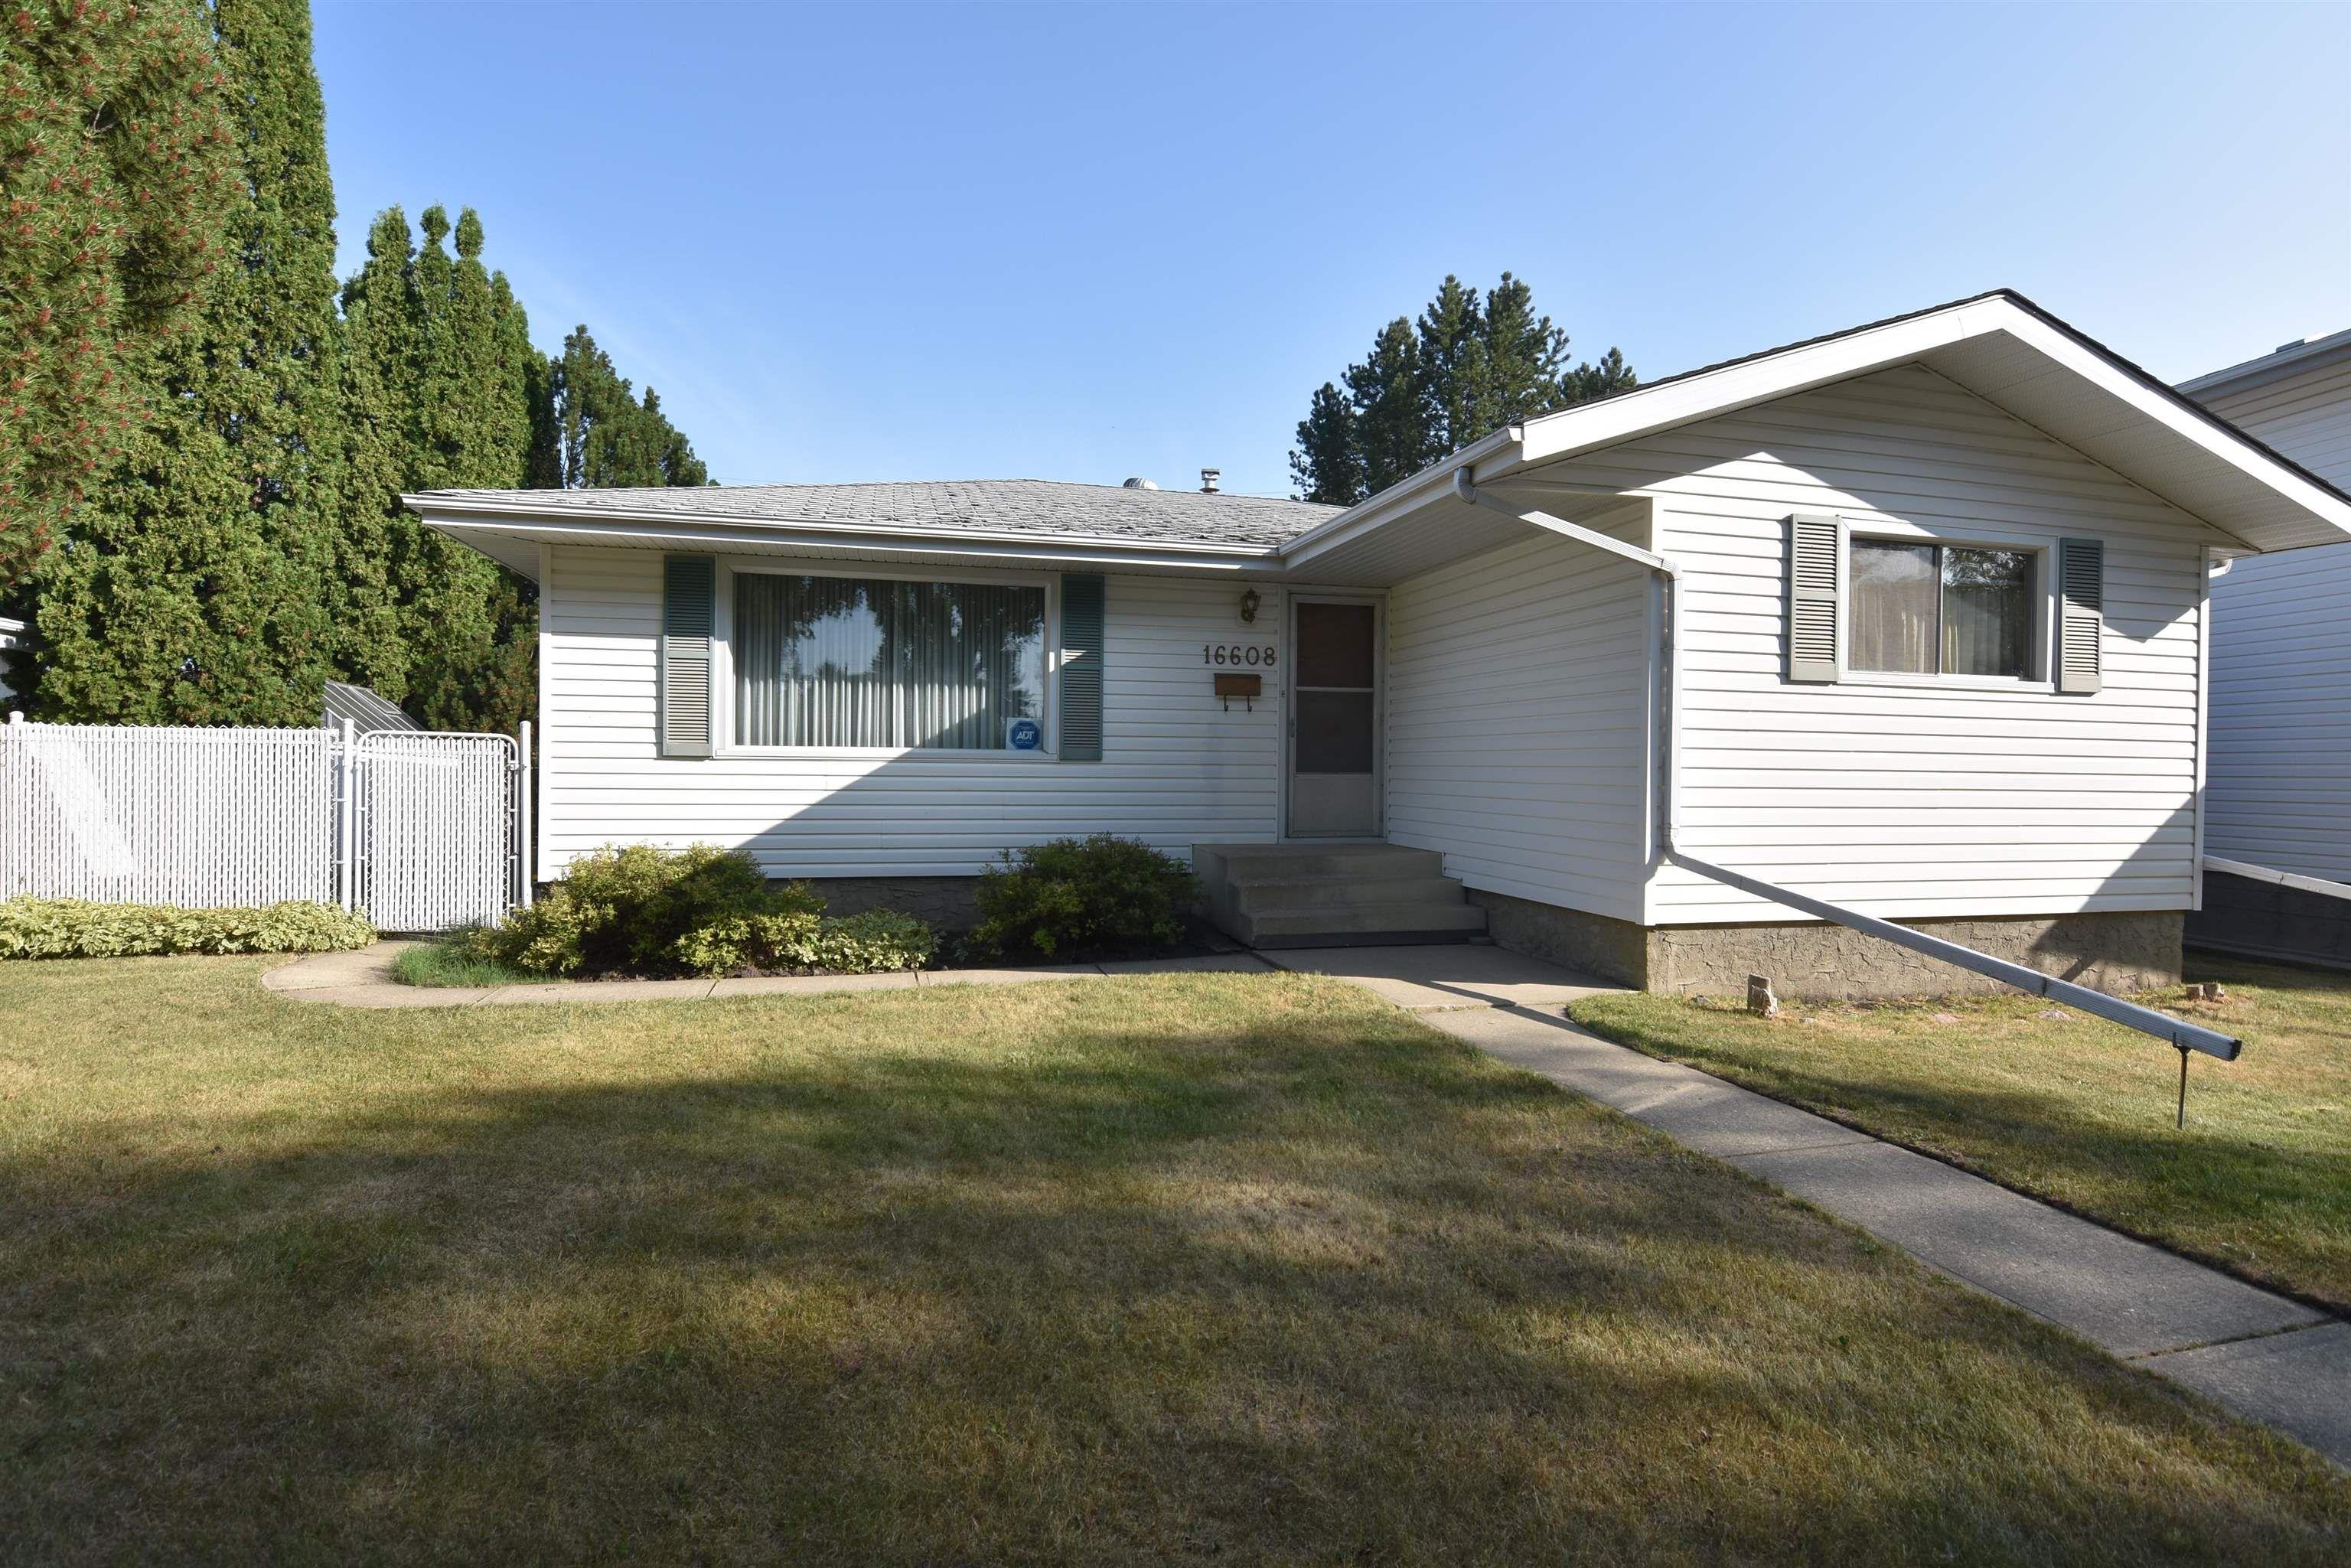 Main Photo: 16608 93 Avenue in Edmonton: Zone 22 House for sale : MLS®# E4259363